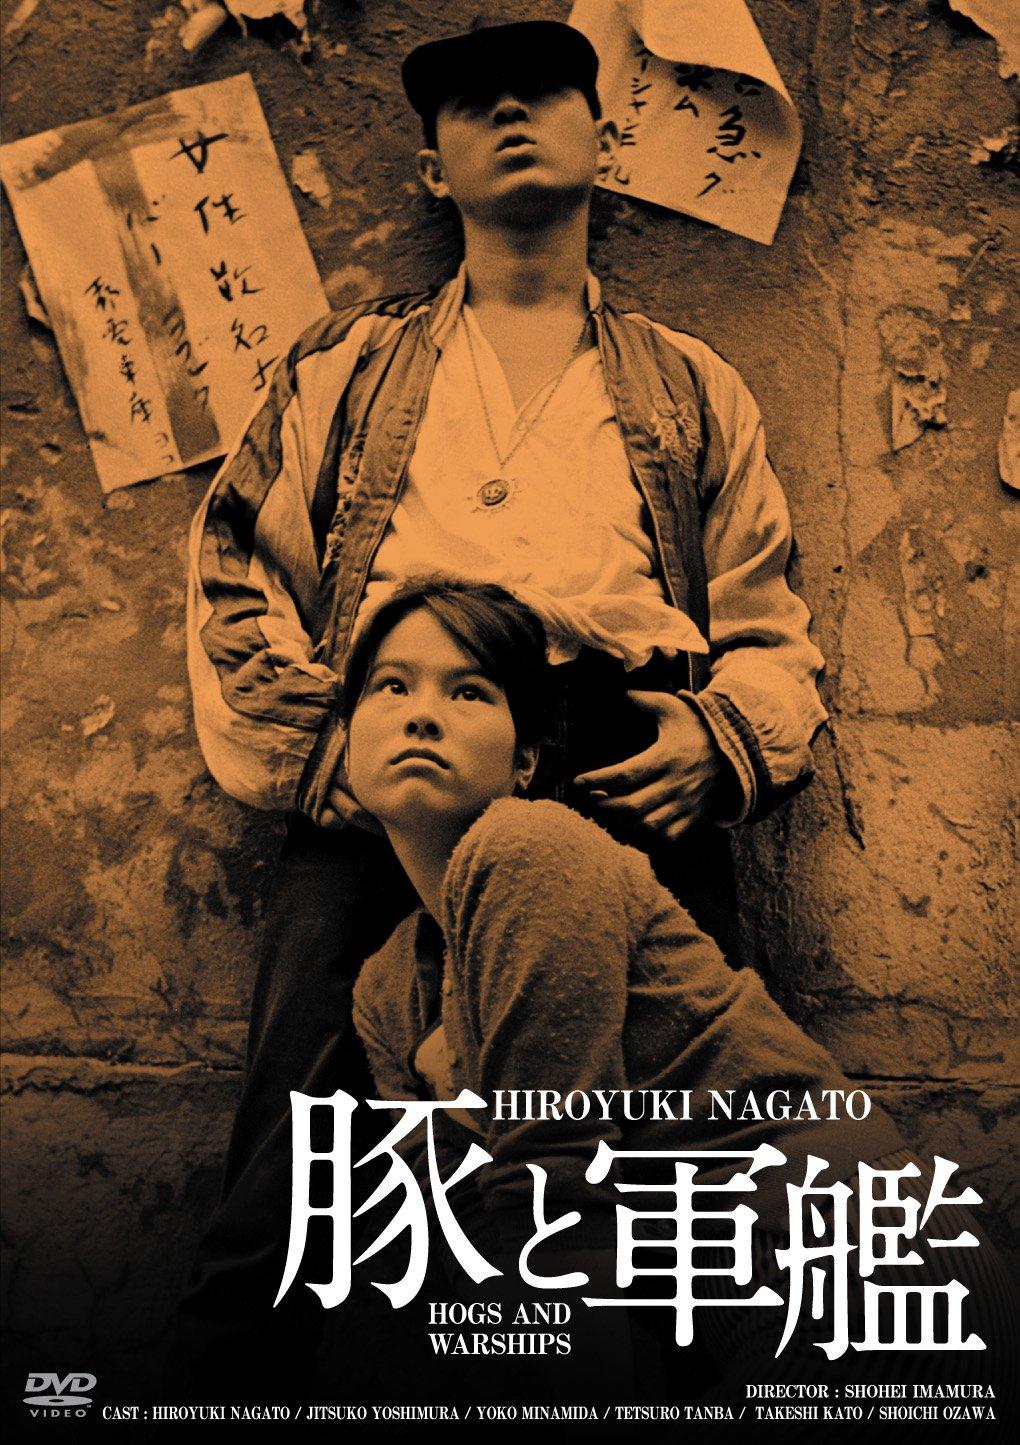 75 BEST SELECT BOX Gメン / 丹波哲郎DVD/ 邦画アクション 【中古】 初限) 【DVD】